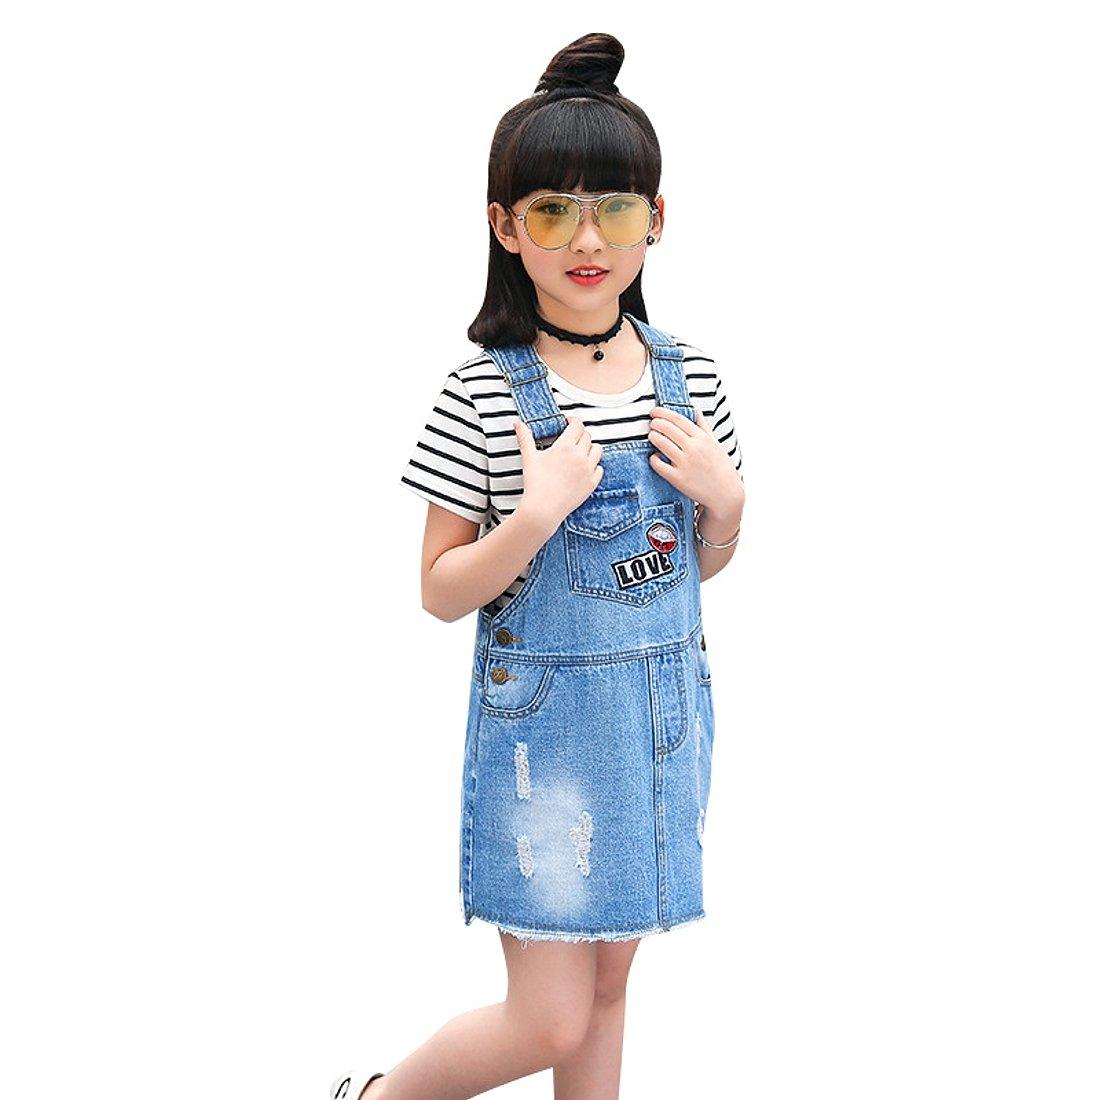 Kidscool Girls Big Bibs Raw Edge Love Lips Summer Overalls Dress,Blue,5-6 Years